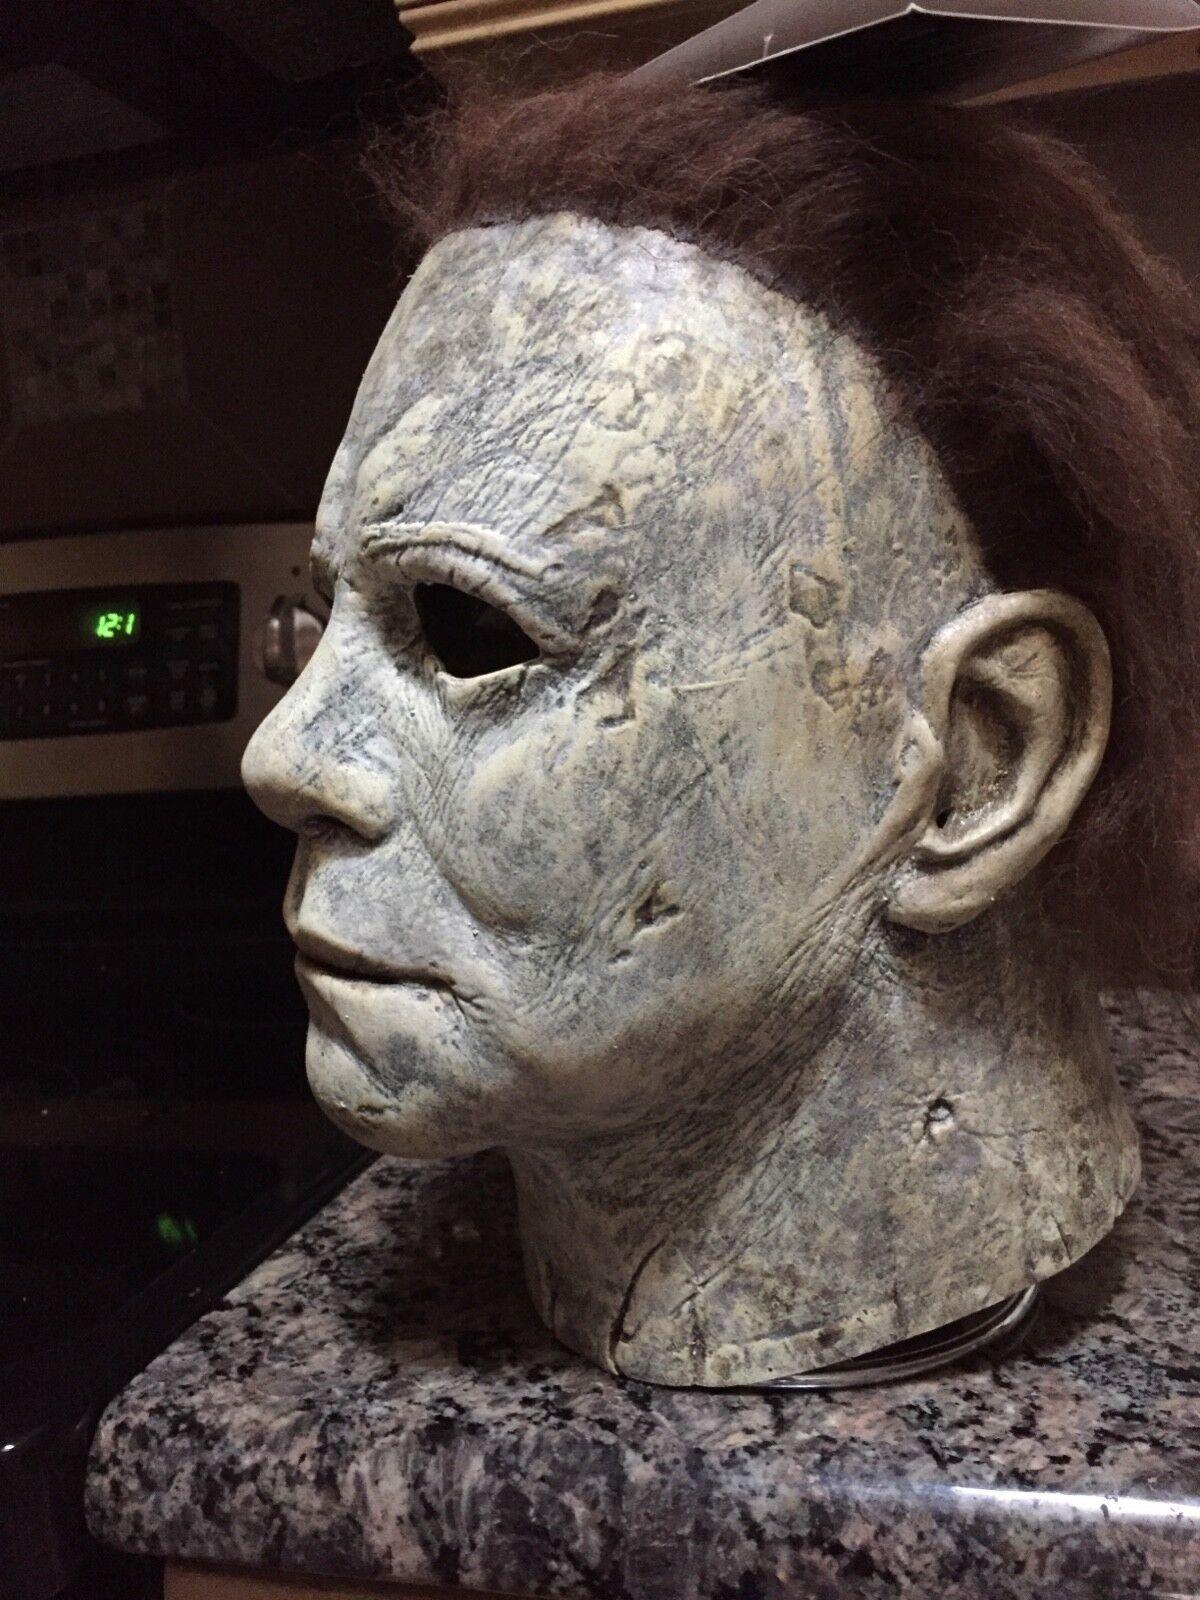 Halloween 2018 Michael Myers Mask.Halloween 2018 Michael Myers Mask Trick Or Treat Studios Shopping Bin Search Ebay Faster